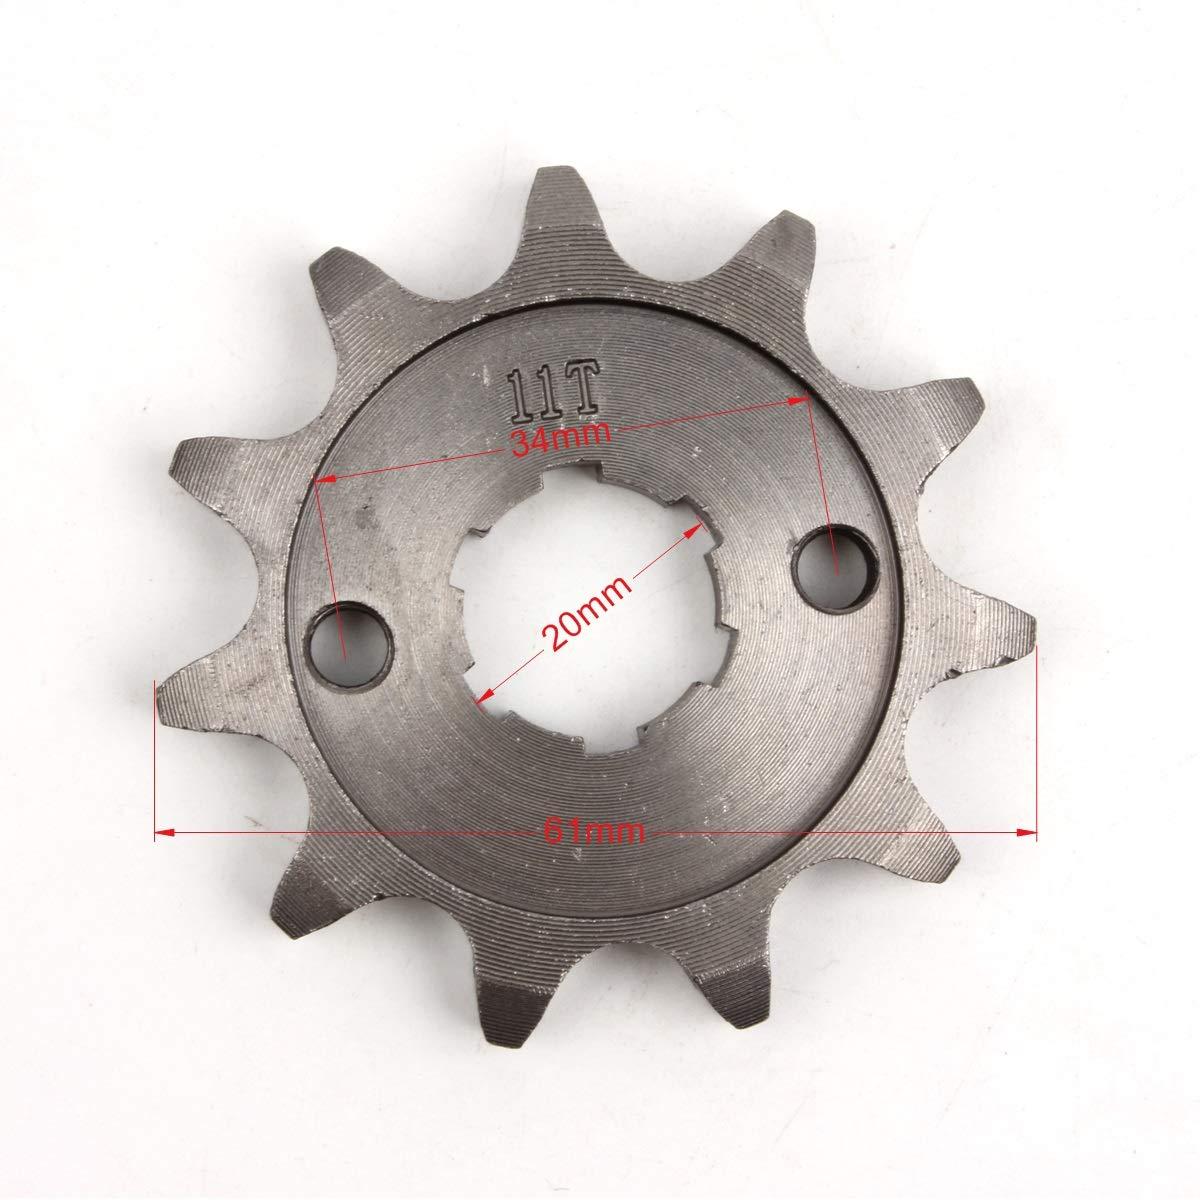 PRO CAKEN 530 11T Front Sprocket with Retainer Plate for Dirt Pit Bike ATV Go-kart DirtBikeClub 5559104759